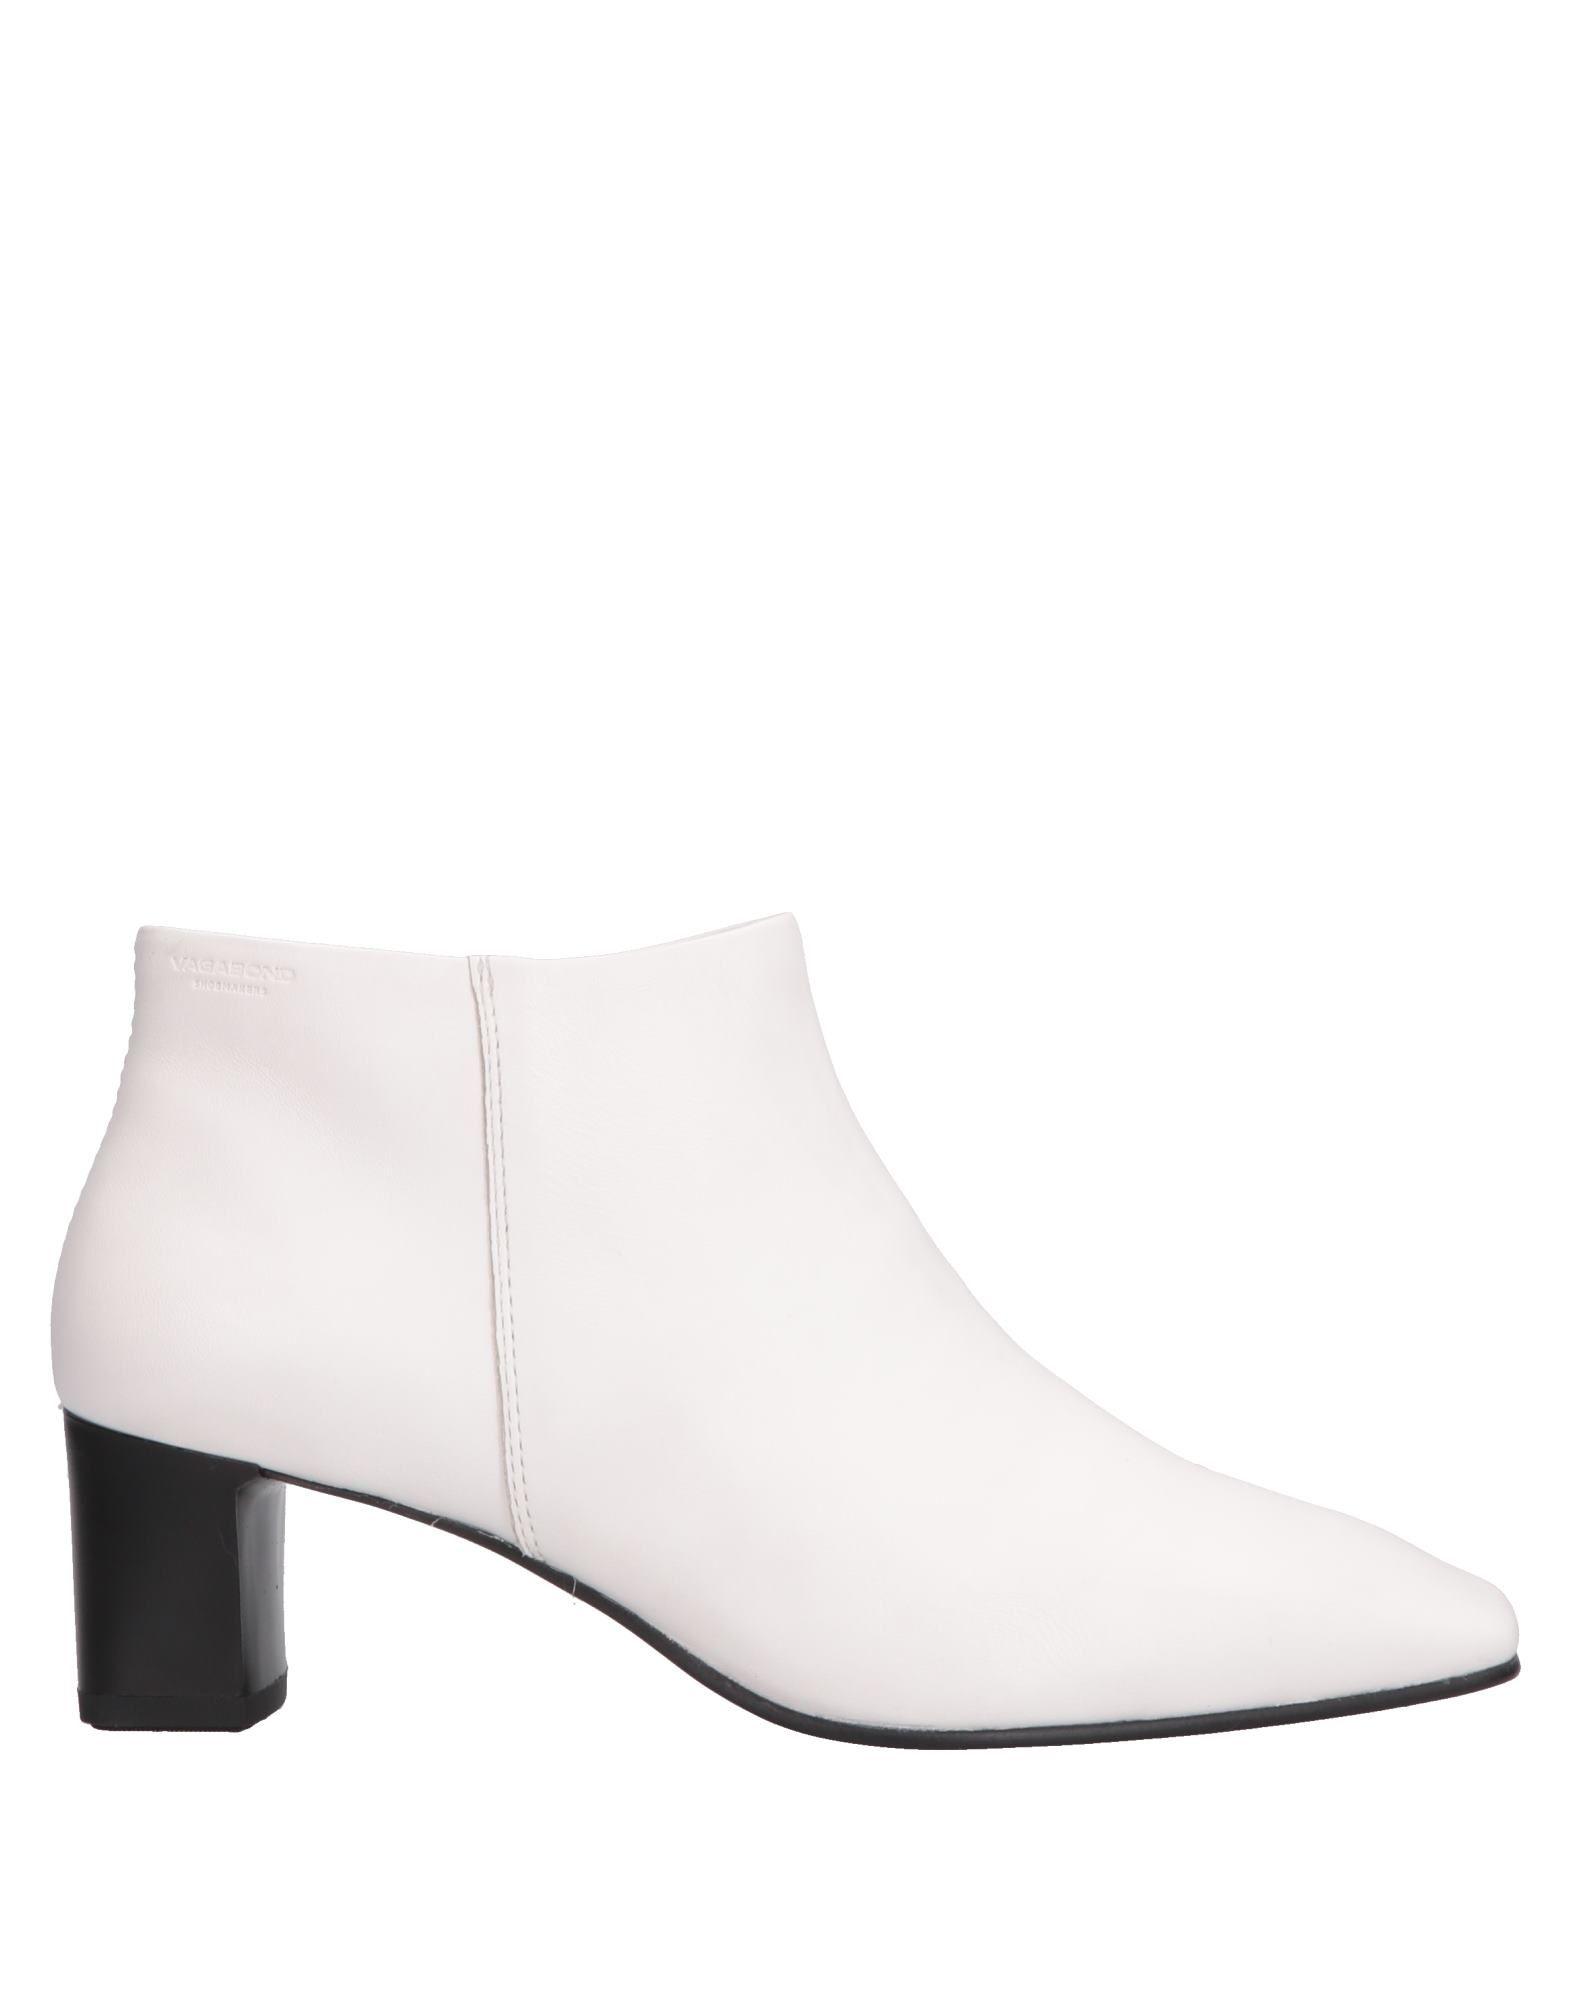 Bottine Vagabond Shoemakers Femme - Bottines Vagabond Shoemakers Noir Super rabais